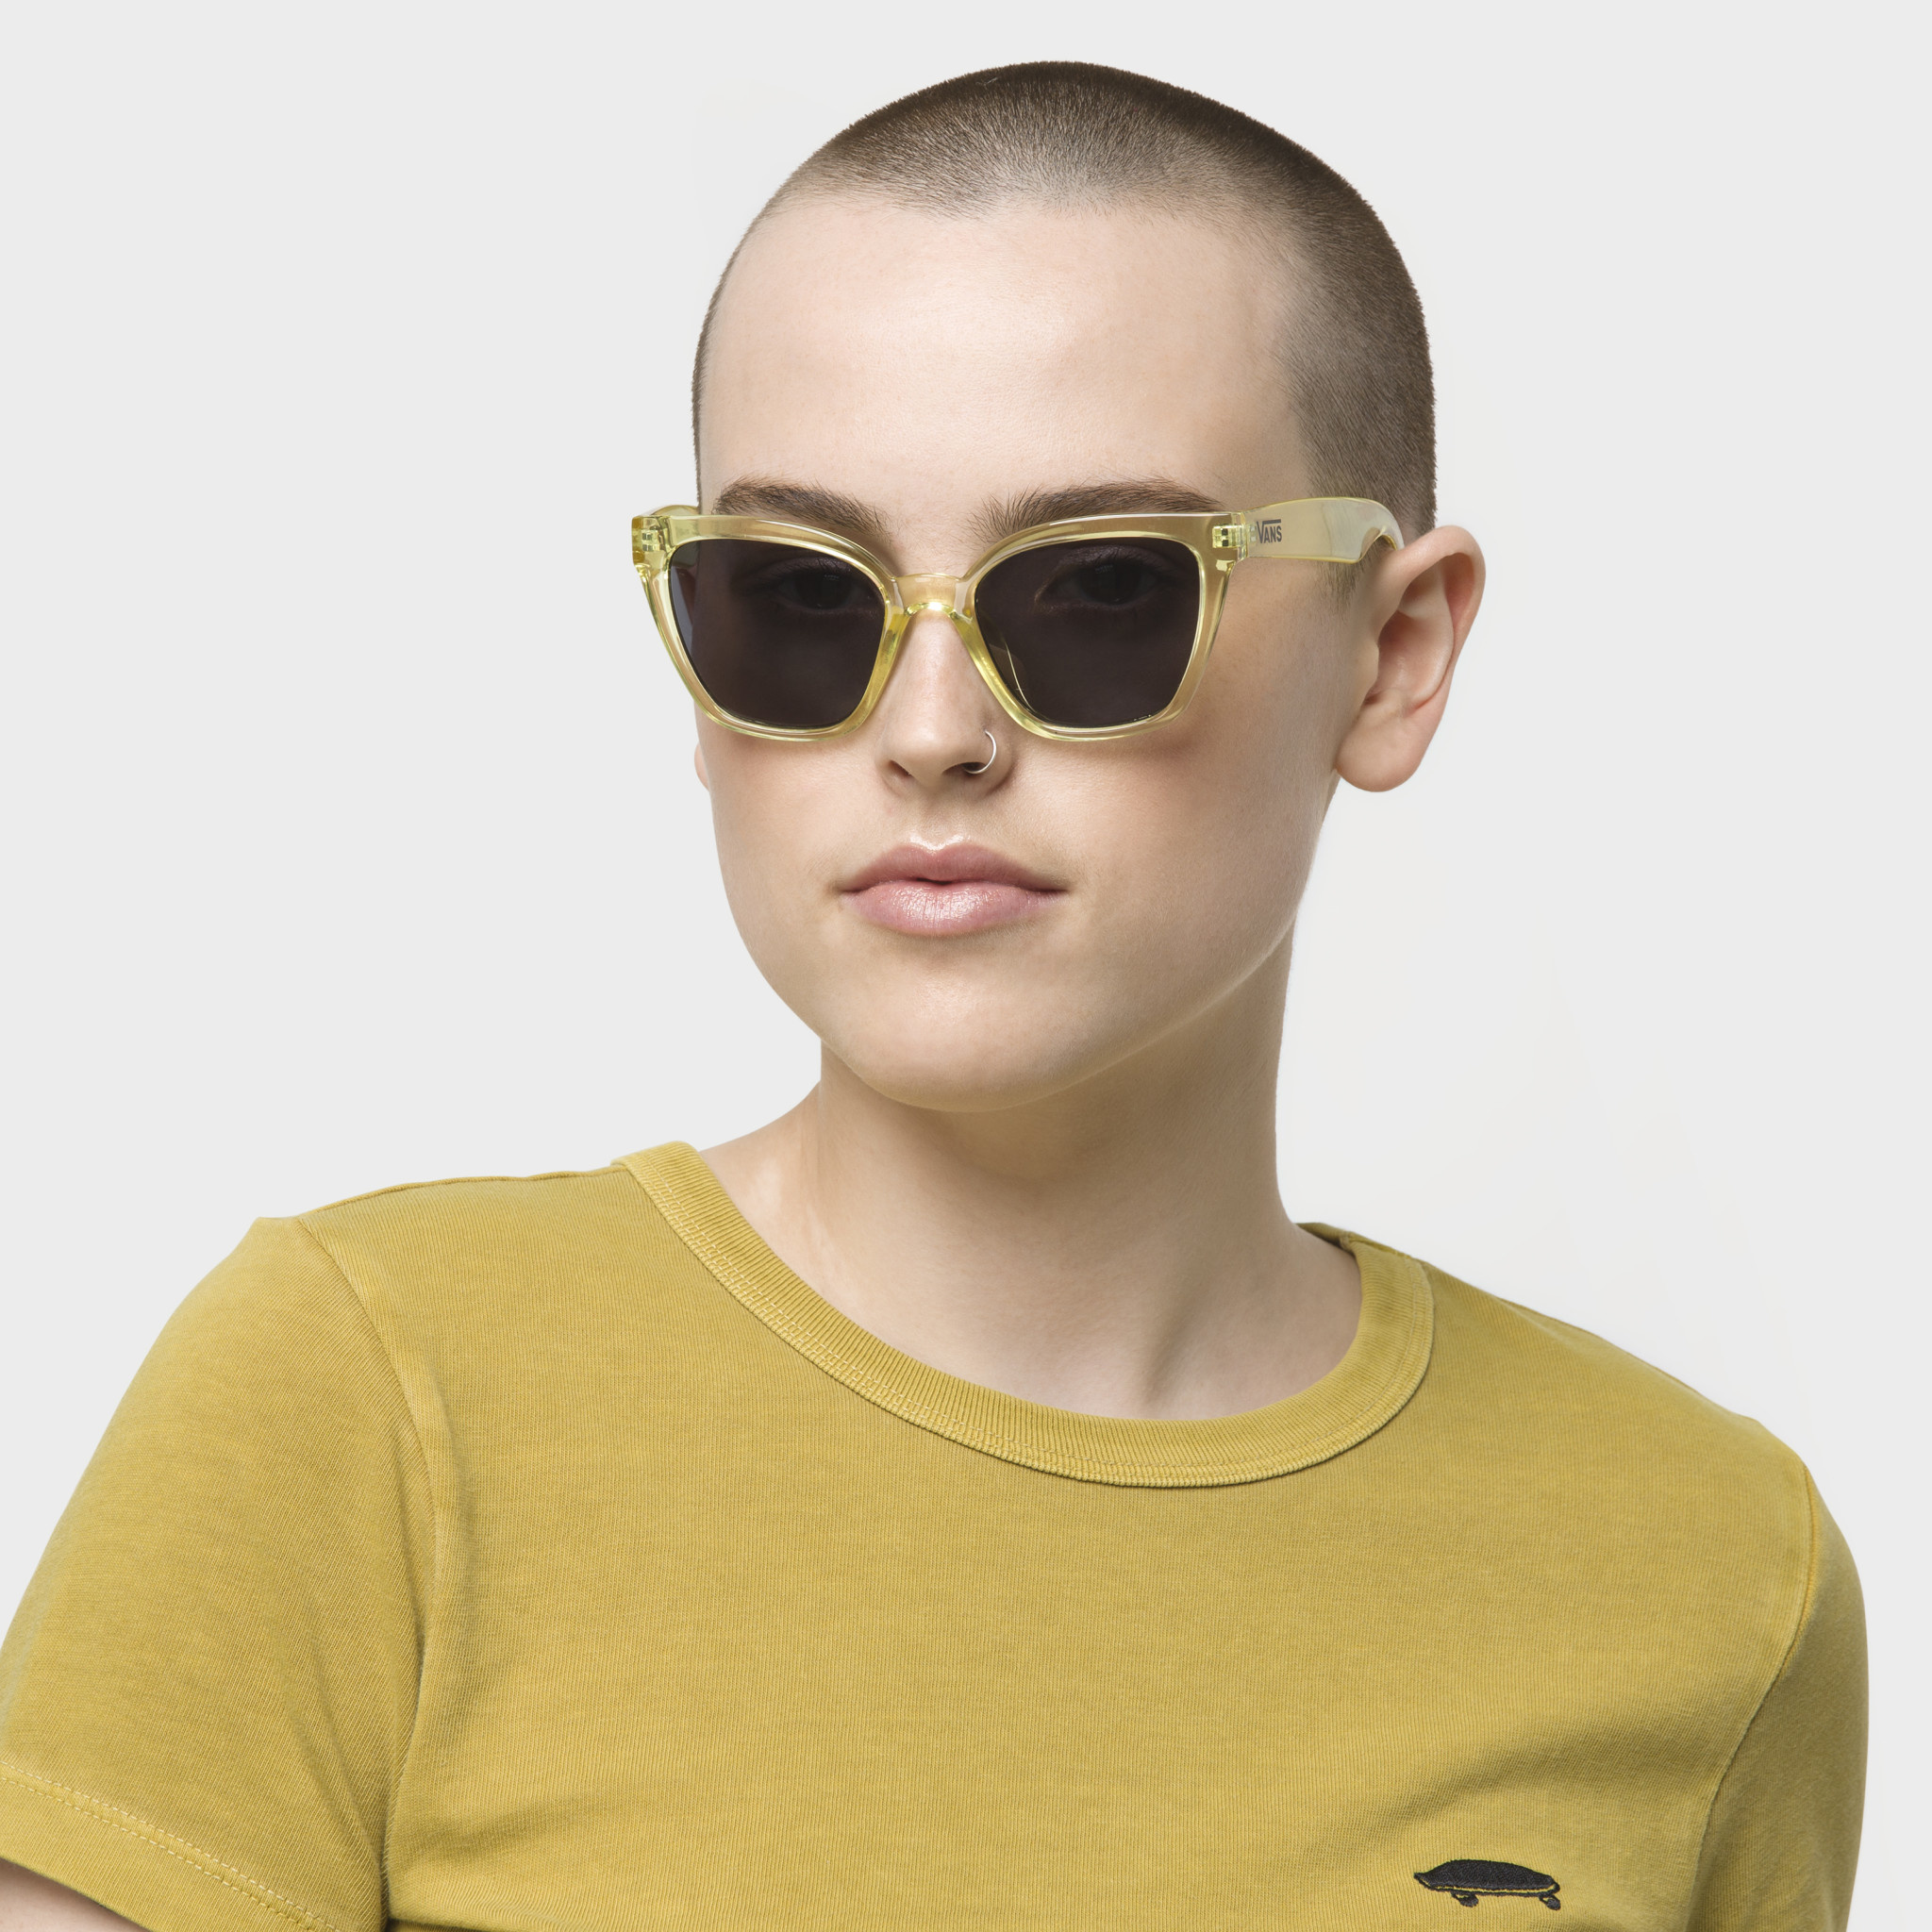 Vans Hip Cat Sunglasses Yellow Pear Edge Of The World